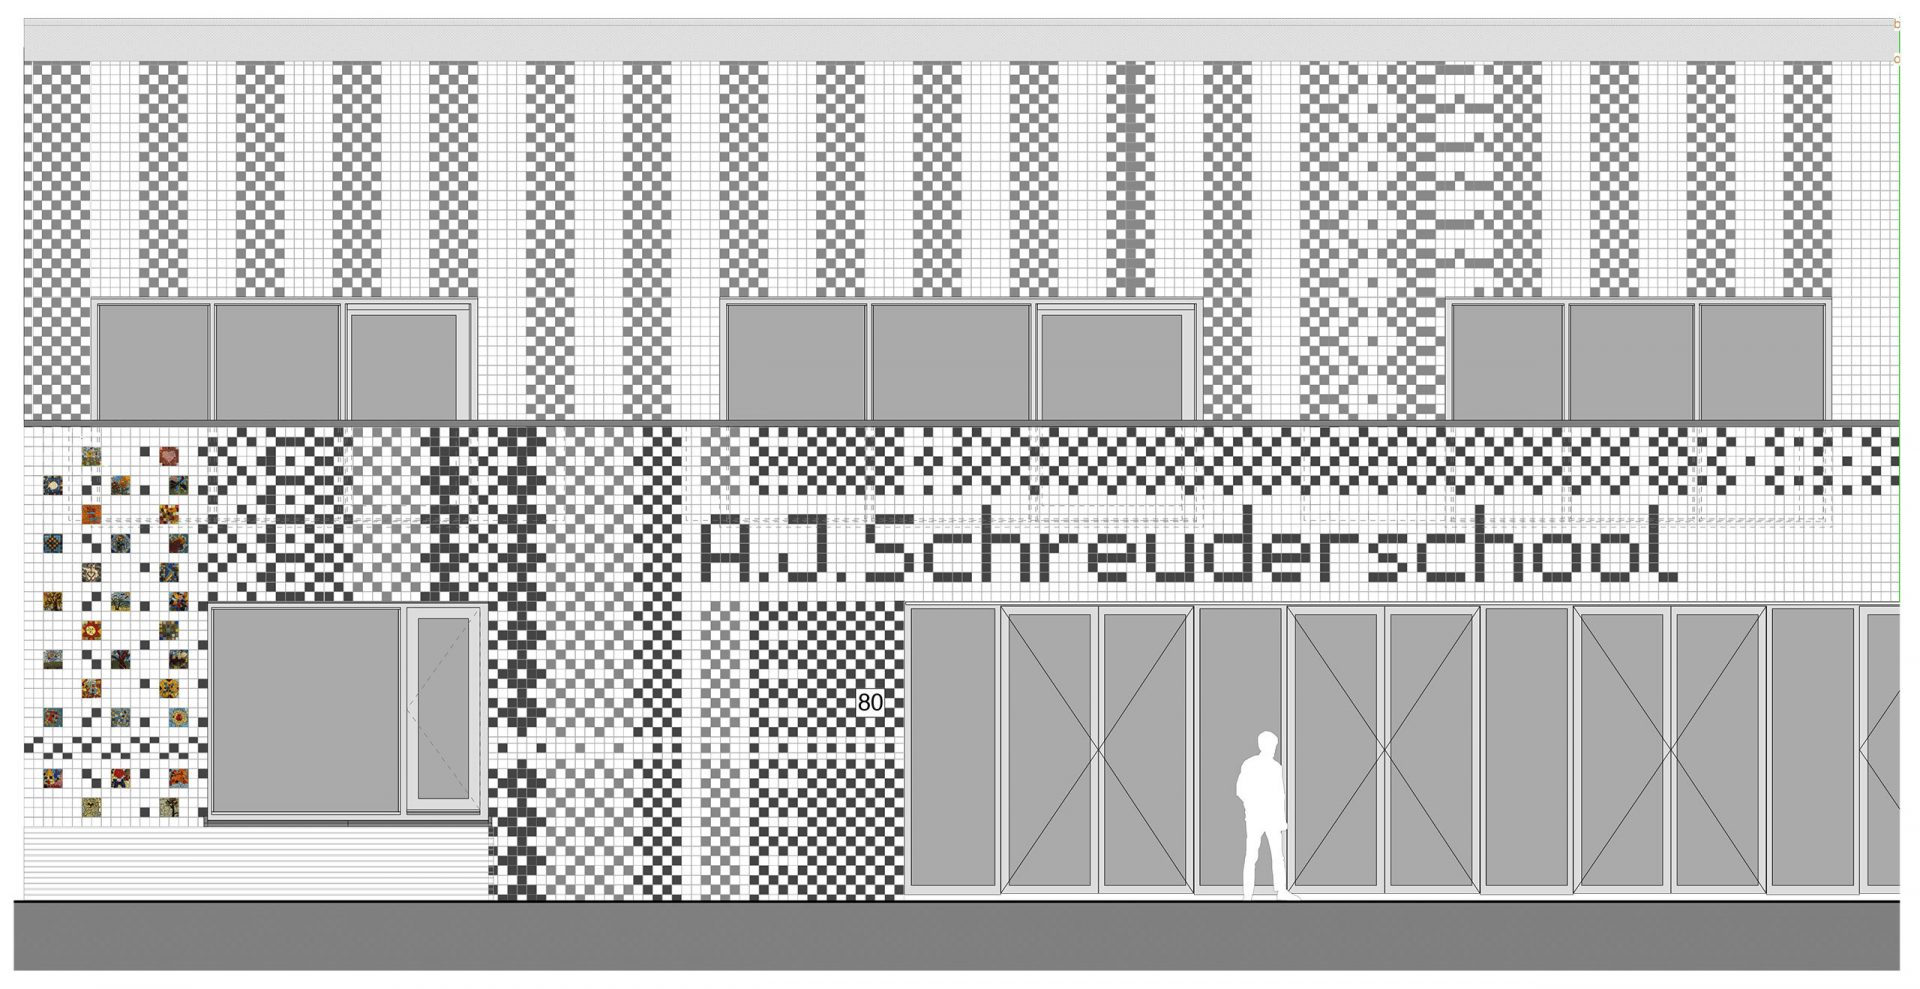 Aj Schreuderschool Tiles Line Drawing